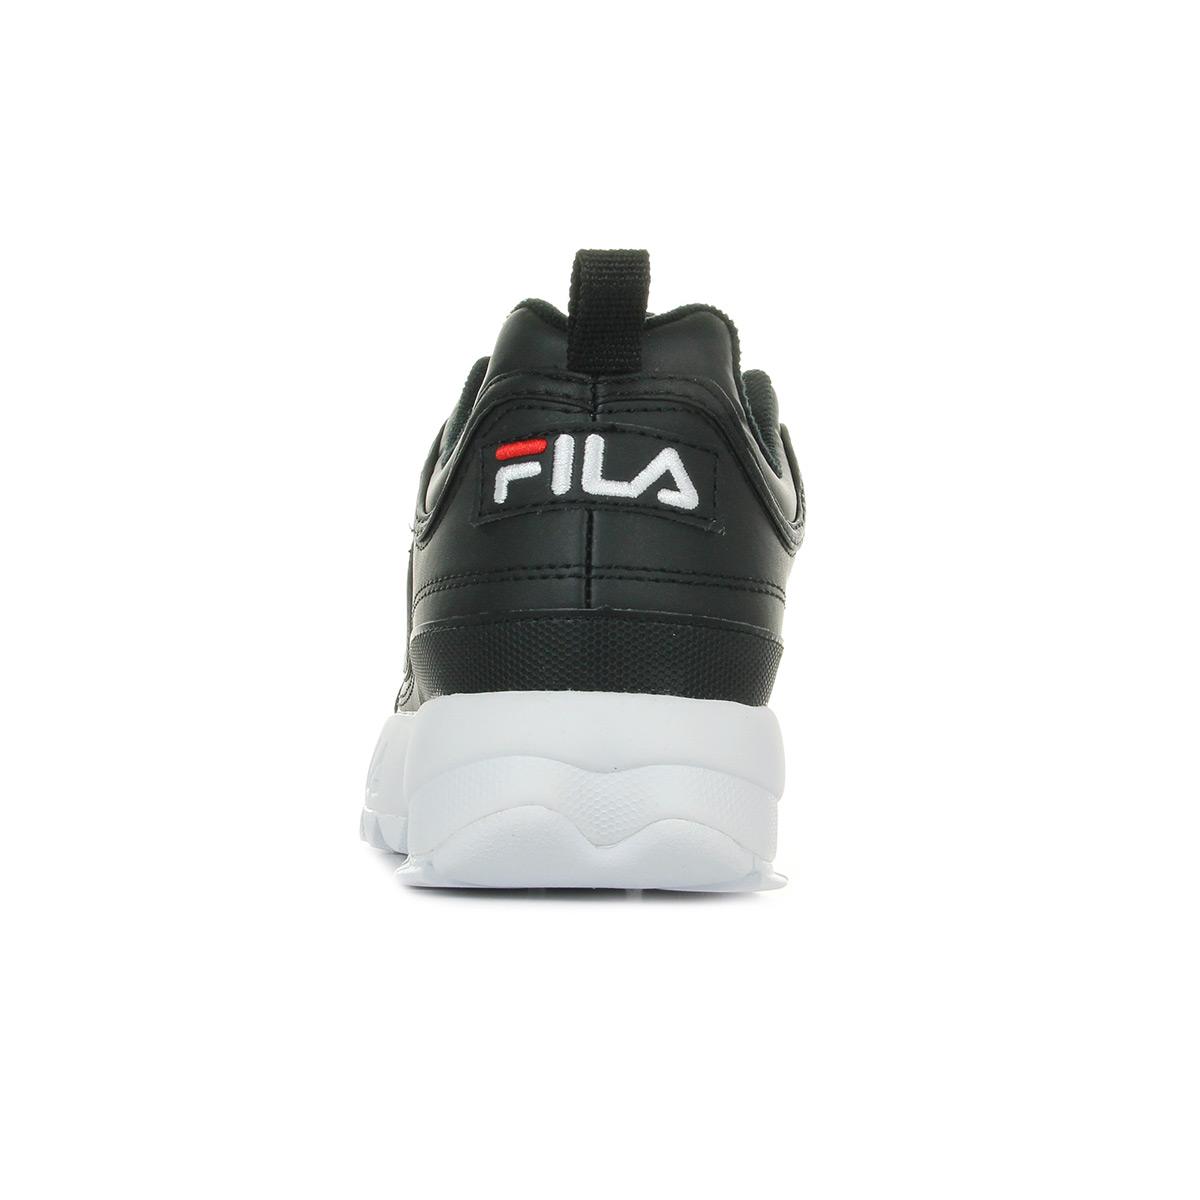 Fila Disruptor Low 101026225Y, Baskets mode homme